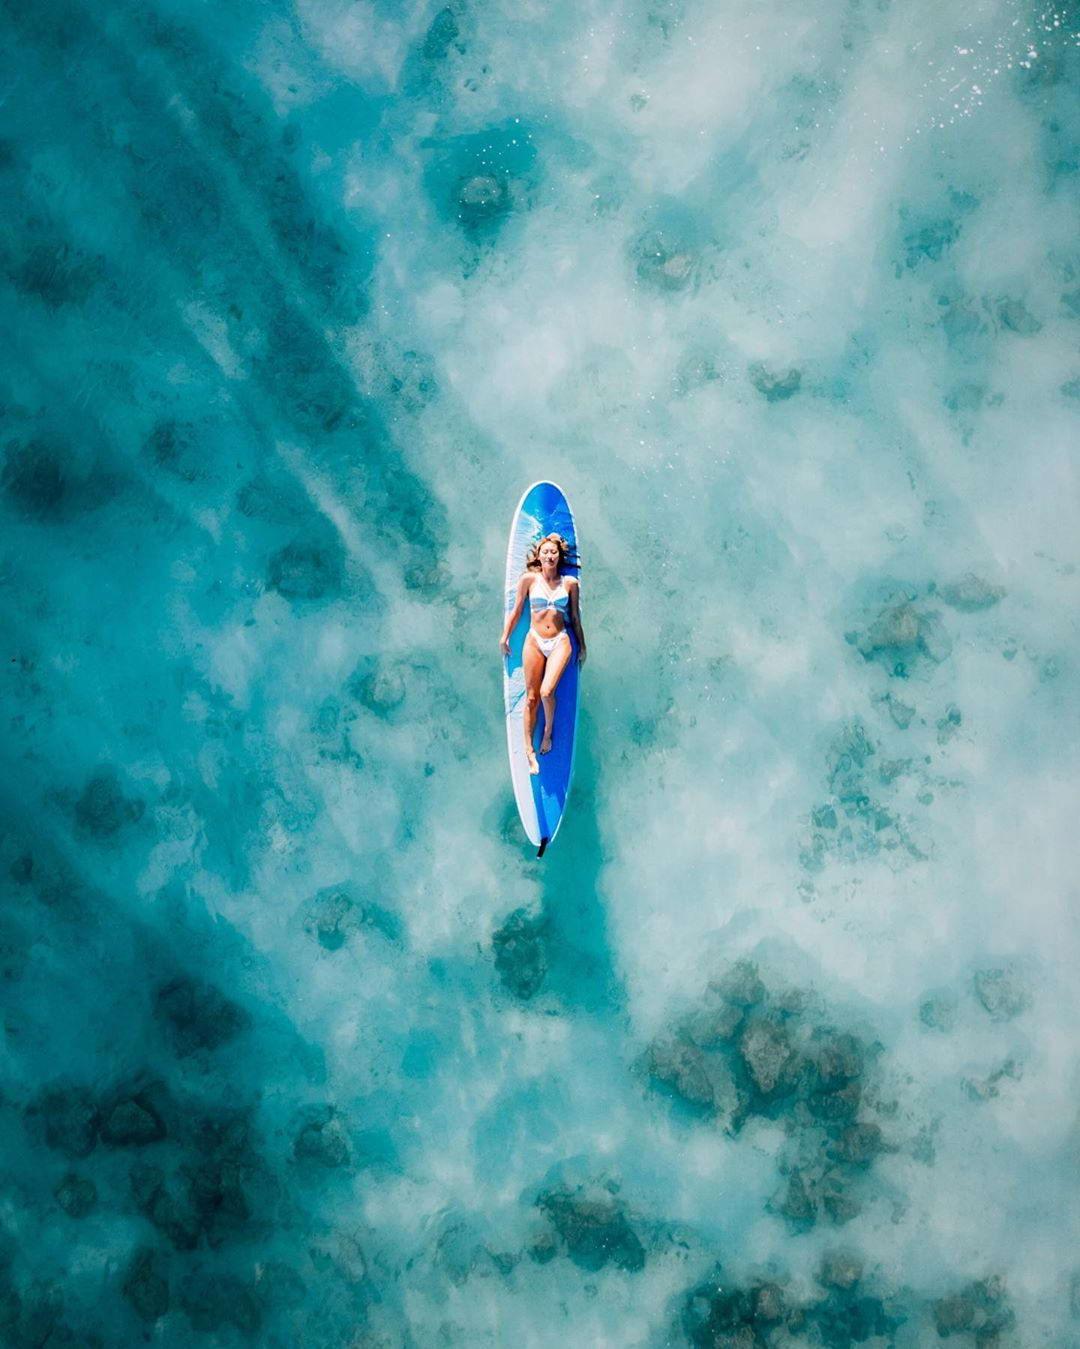 Гавайи на фотографиях Винсента Лима (25 фото)